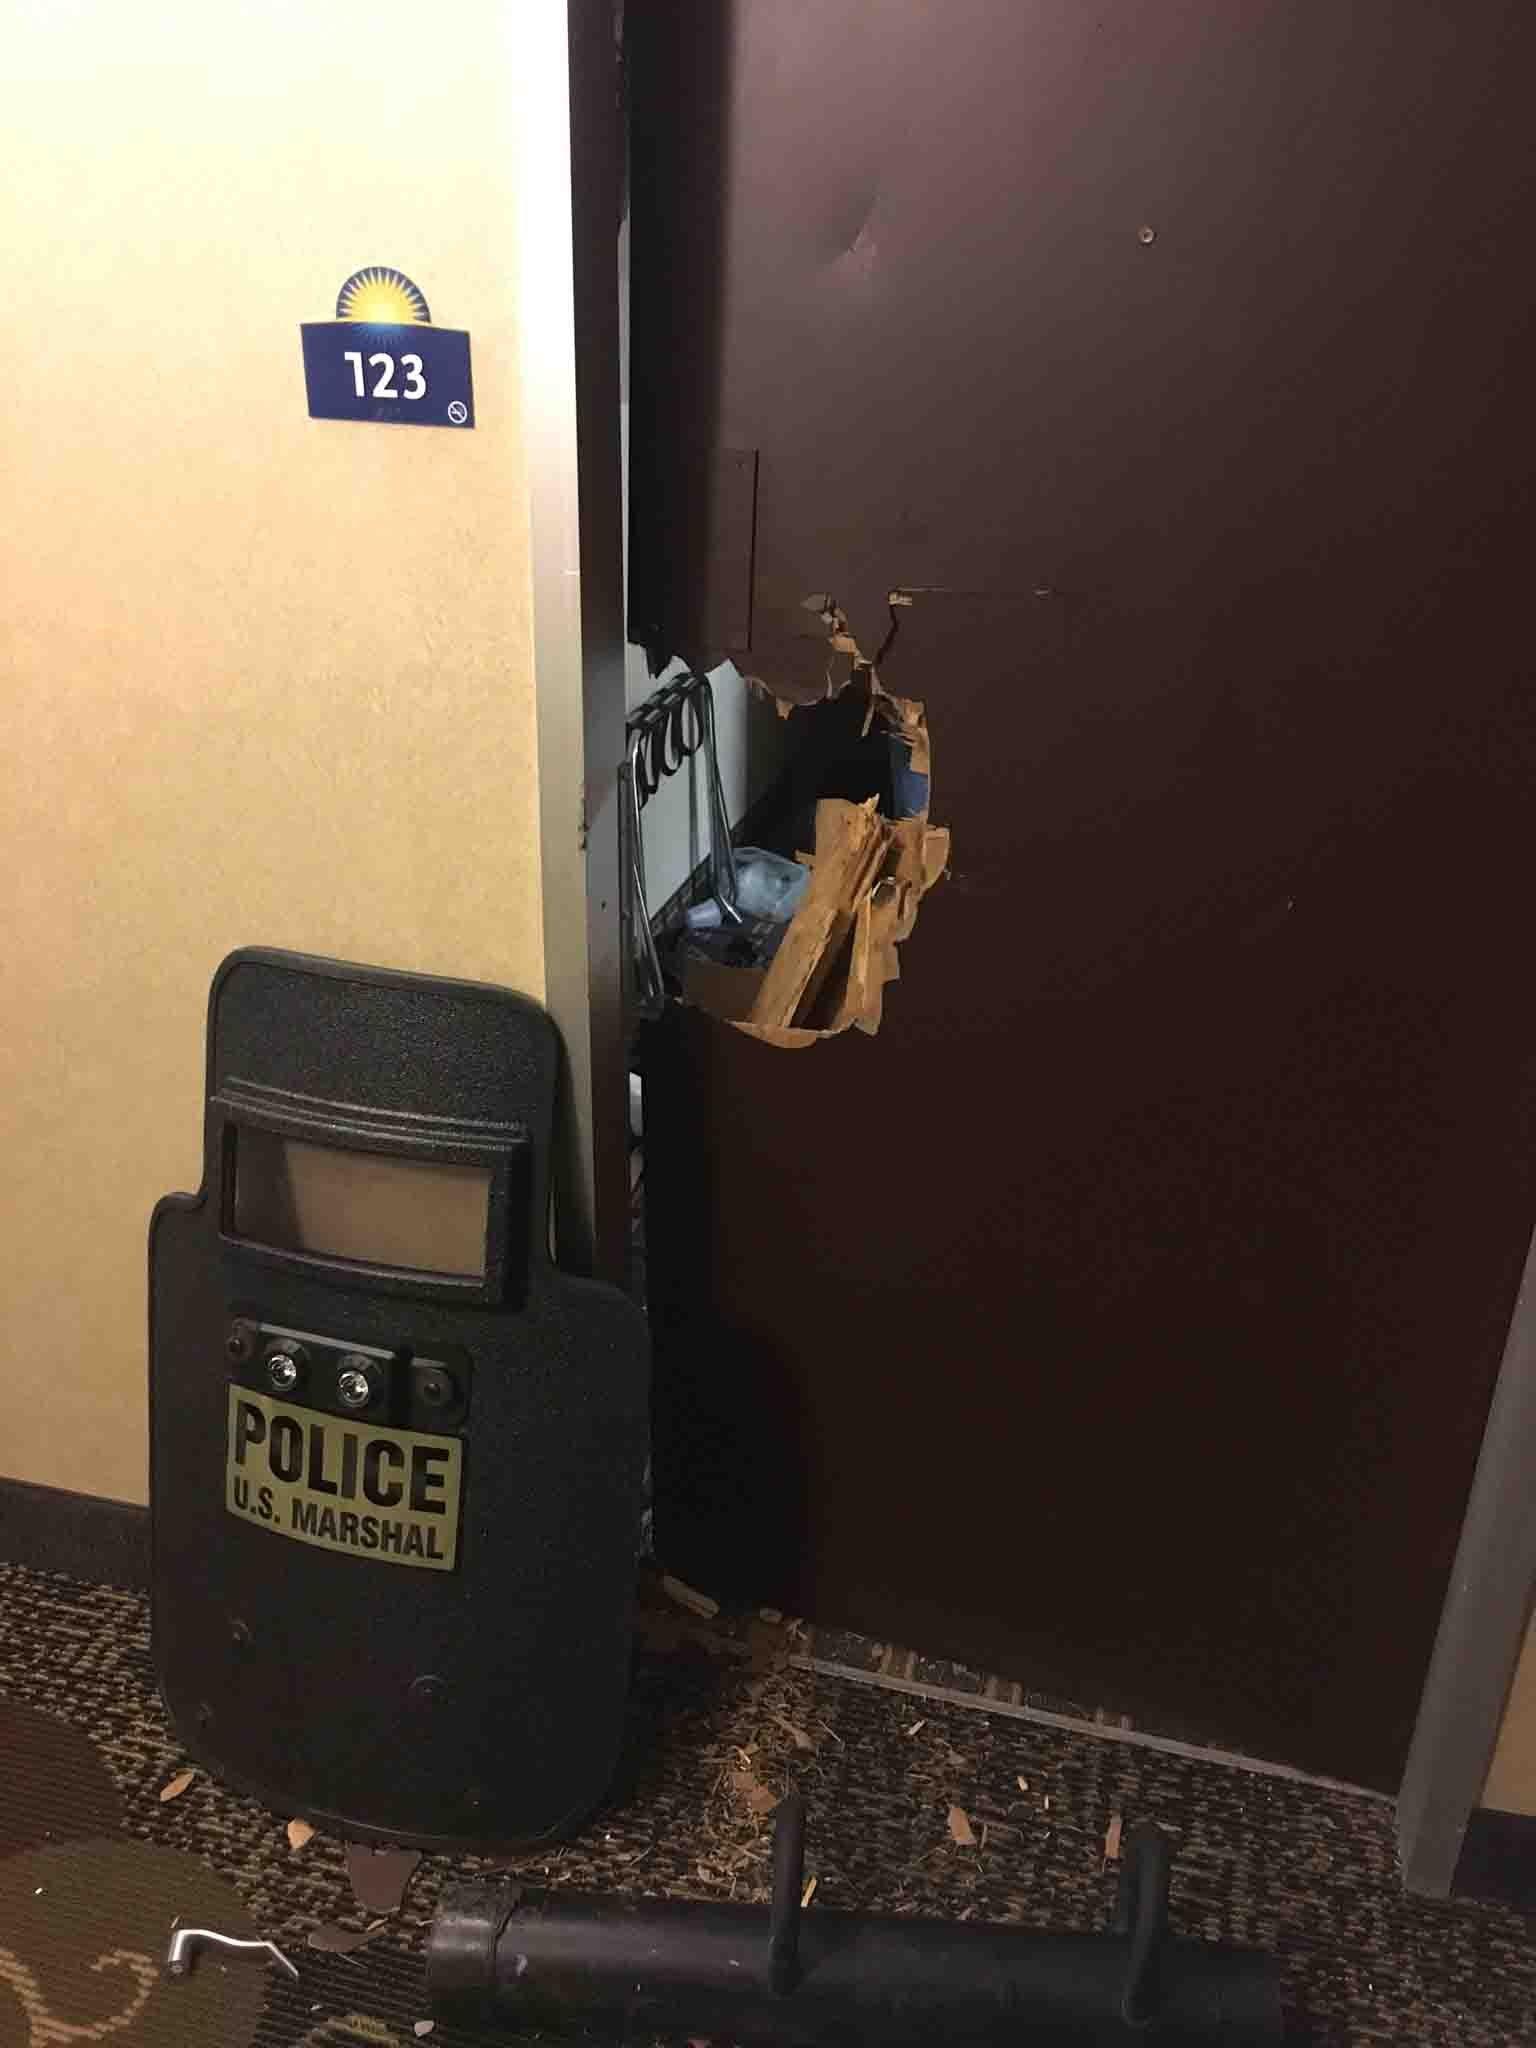 U.S. marshals helped take Alexander into custody at a Days Inn Motel in Vernon. (Hartford police photo)